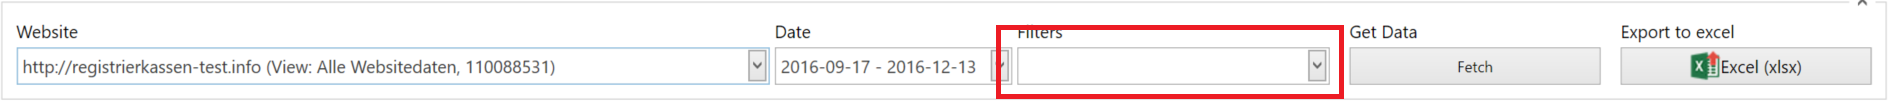 Google Analytics: Add Filter